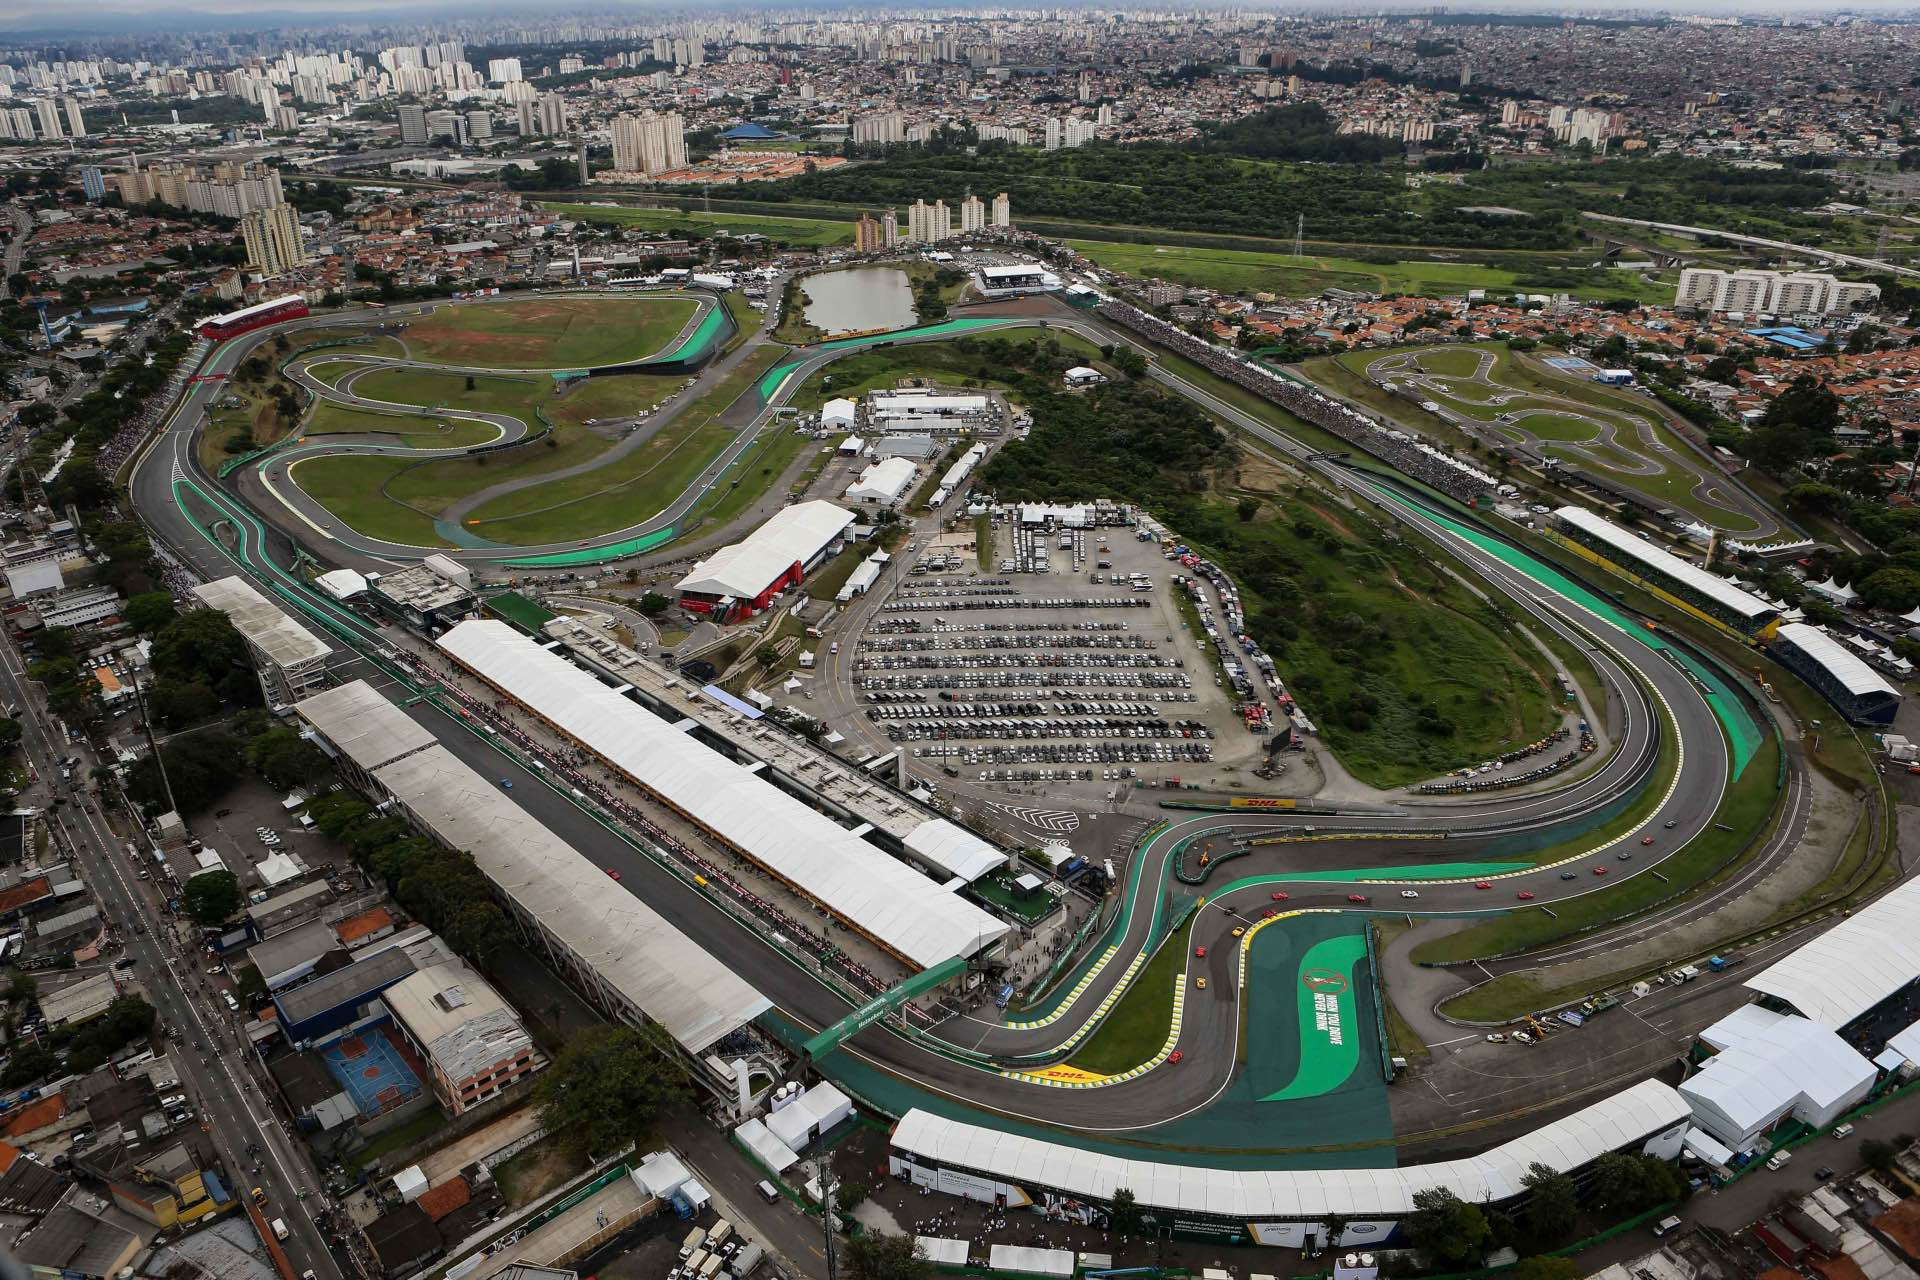 2017 Brazilian Grand Prix, Saturday – Wolfgang Wilhelm